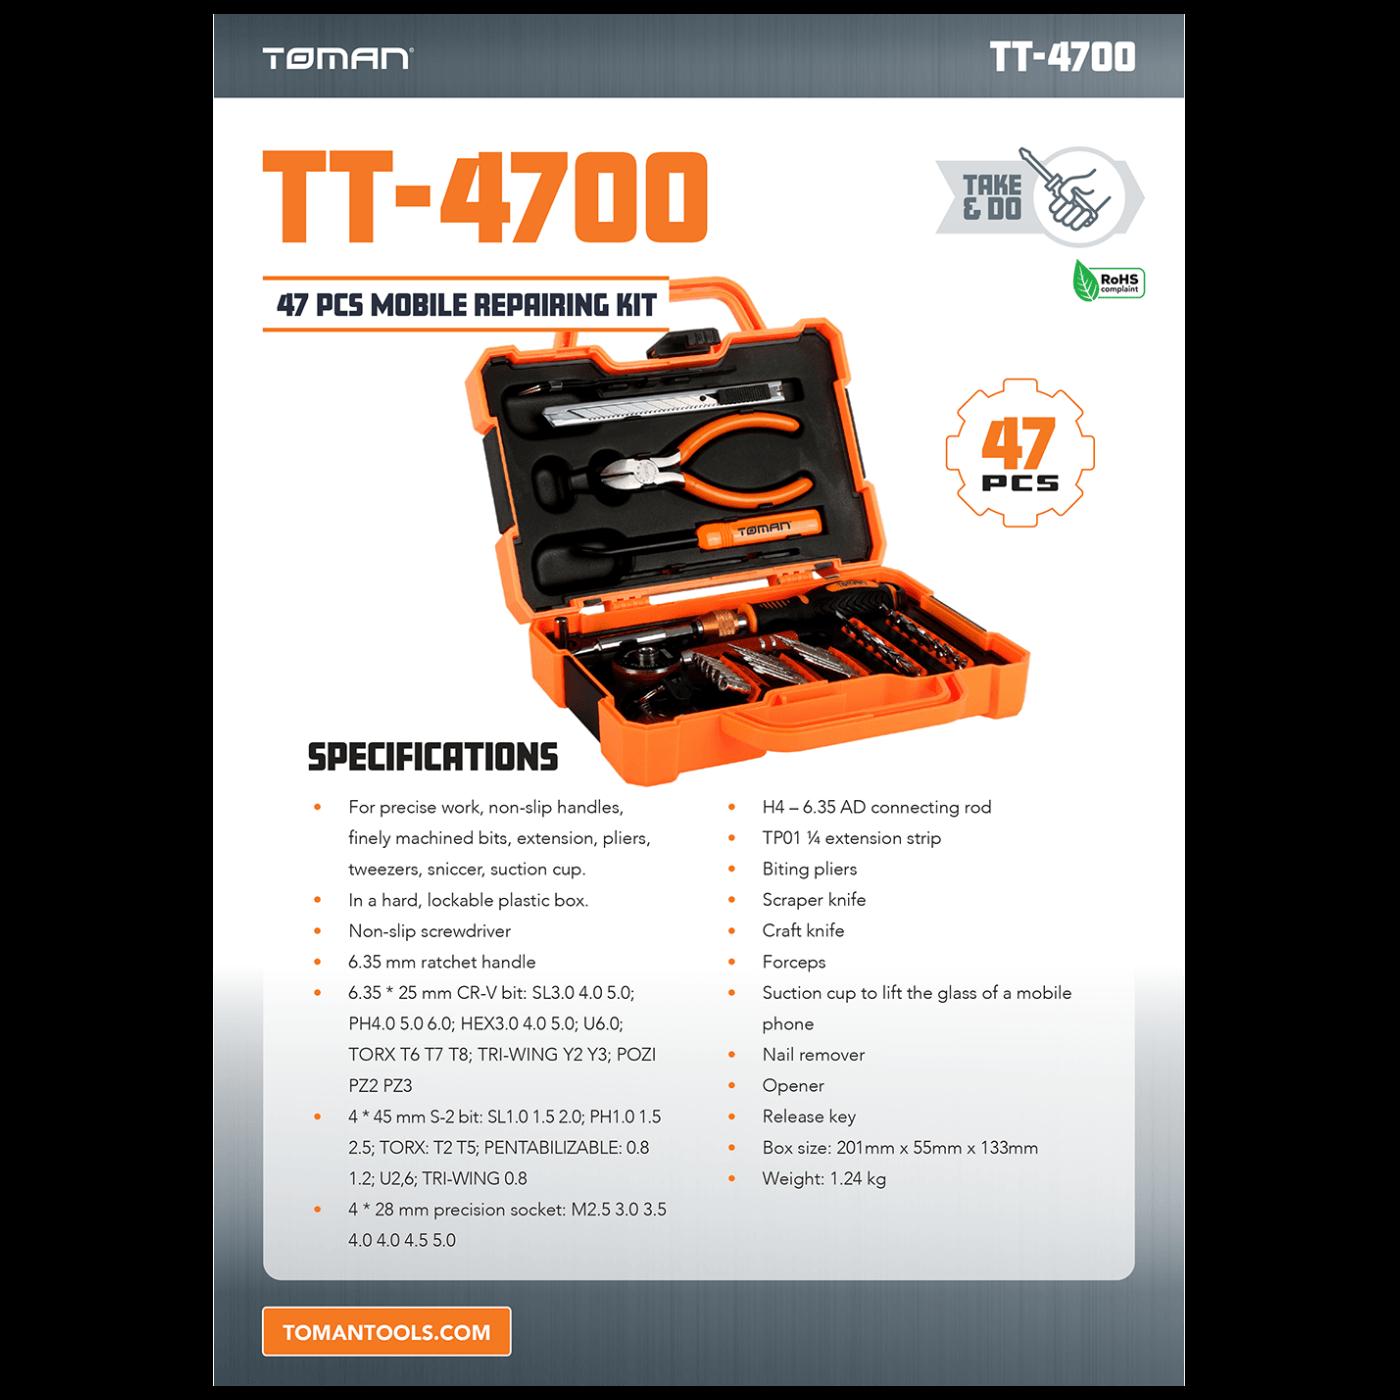 TT4700